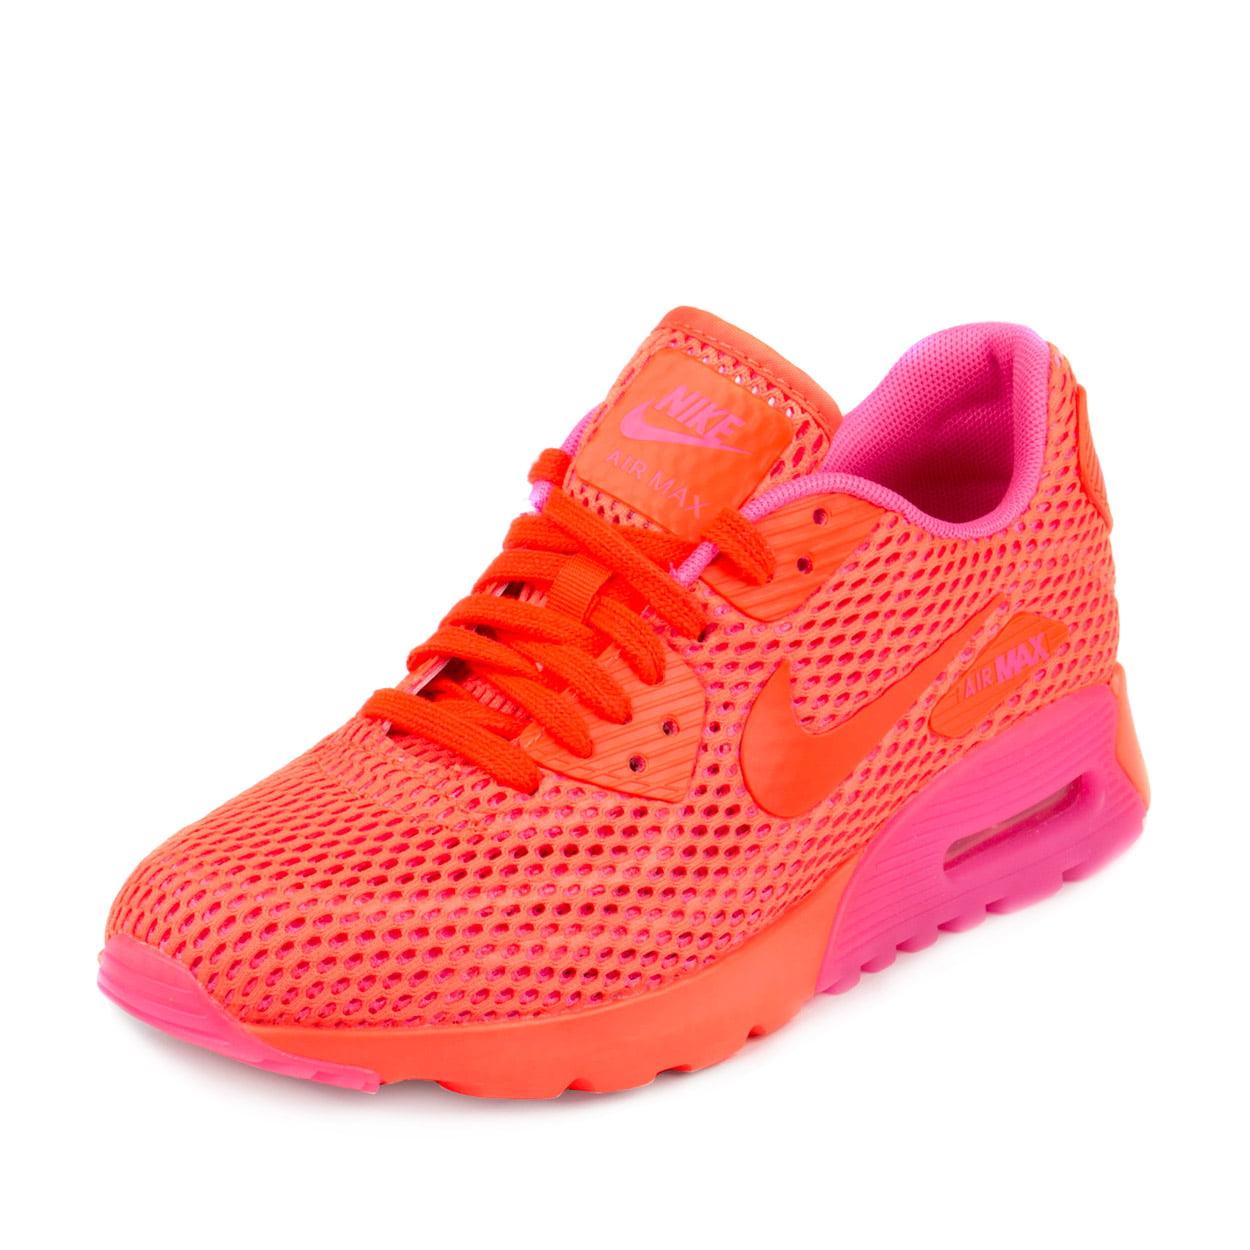 Nike - Nike Womens Air Max 90 Ultra BR Total Crimson/Pink Blast 725061-800 - Walmart.com